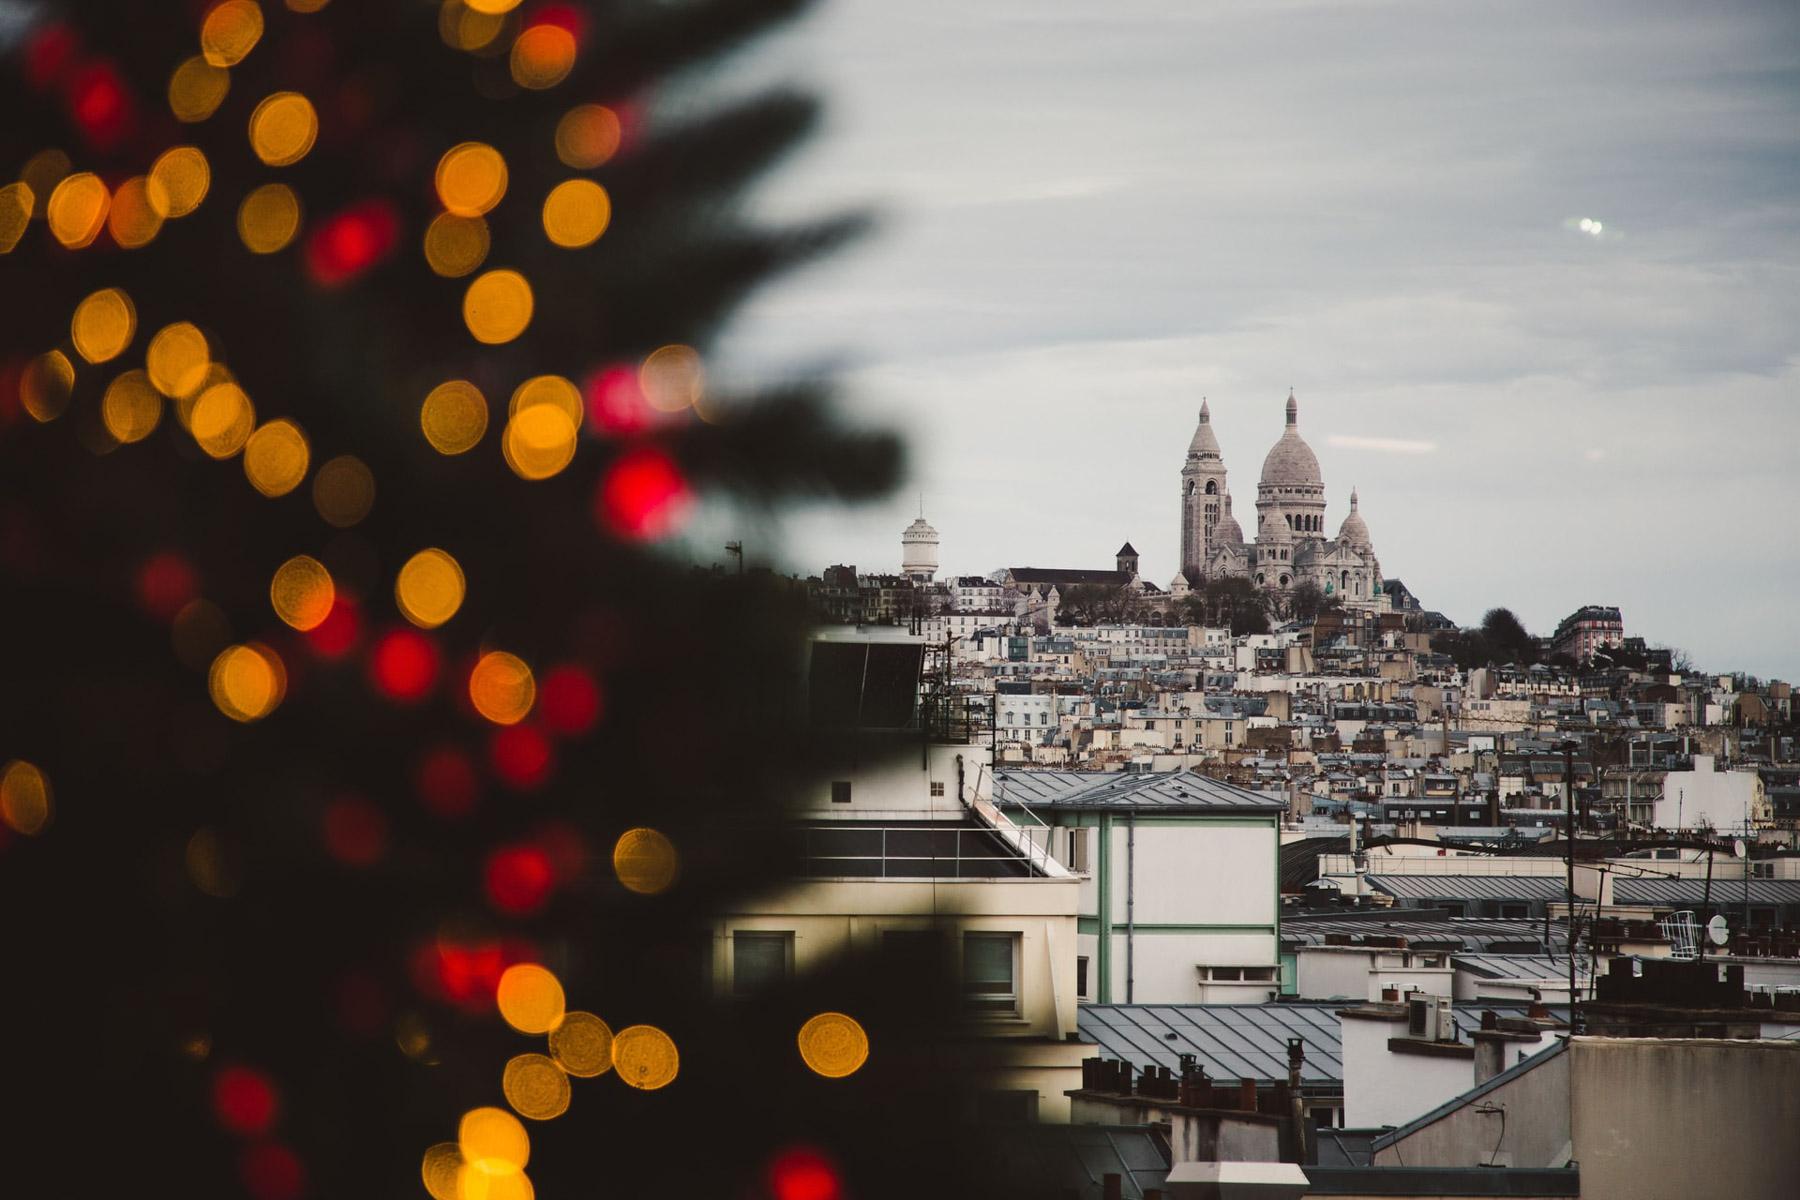 villes-a-visiter-cet-hiver